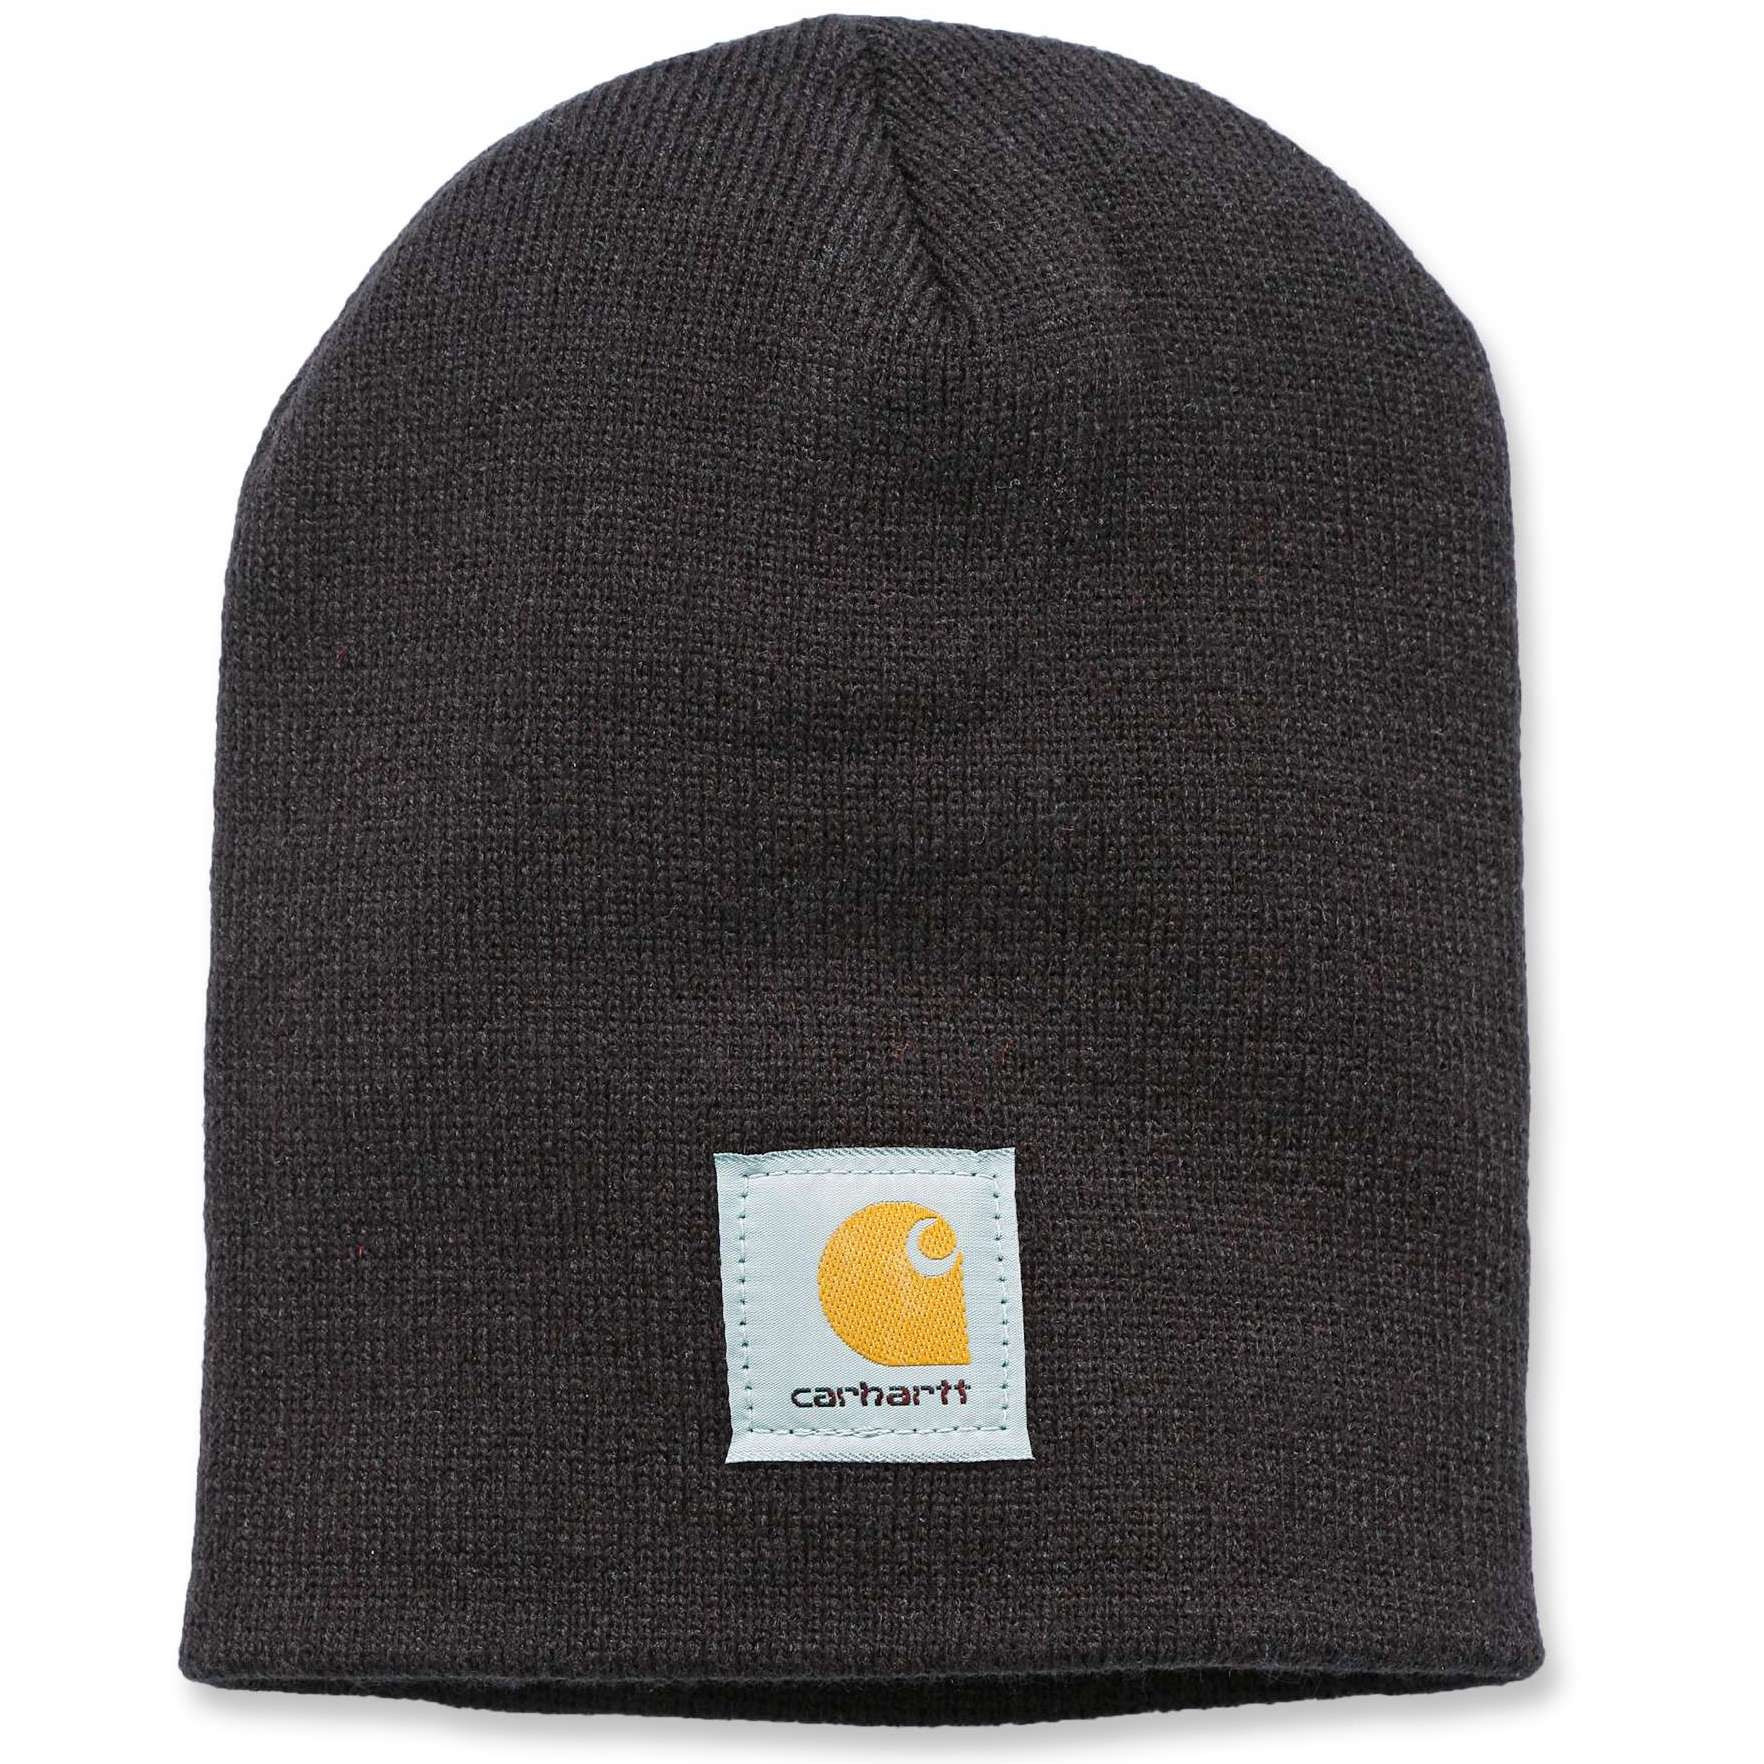 Шапка Carhartt Acrylic Knit Hat - A205 (Black, OFA)